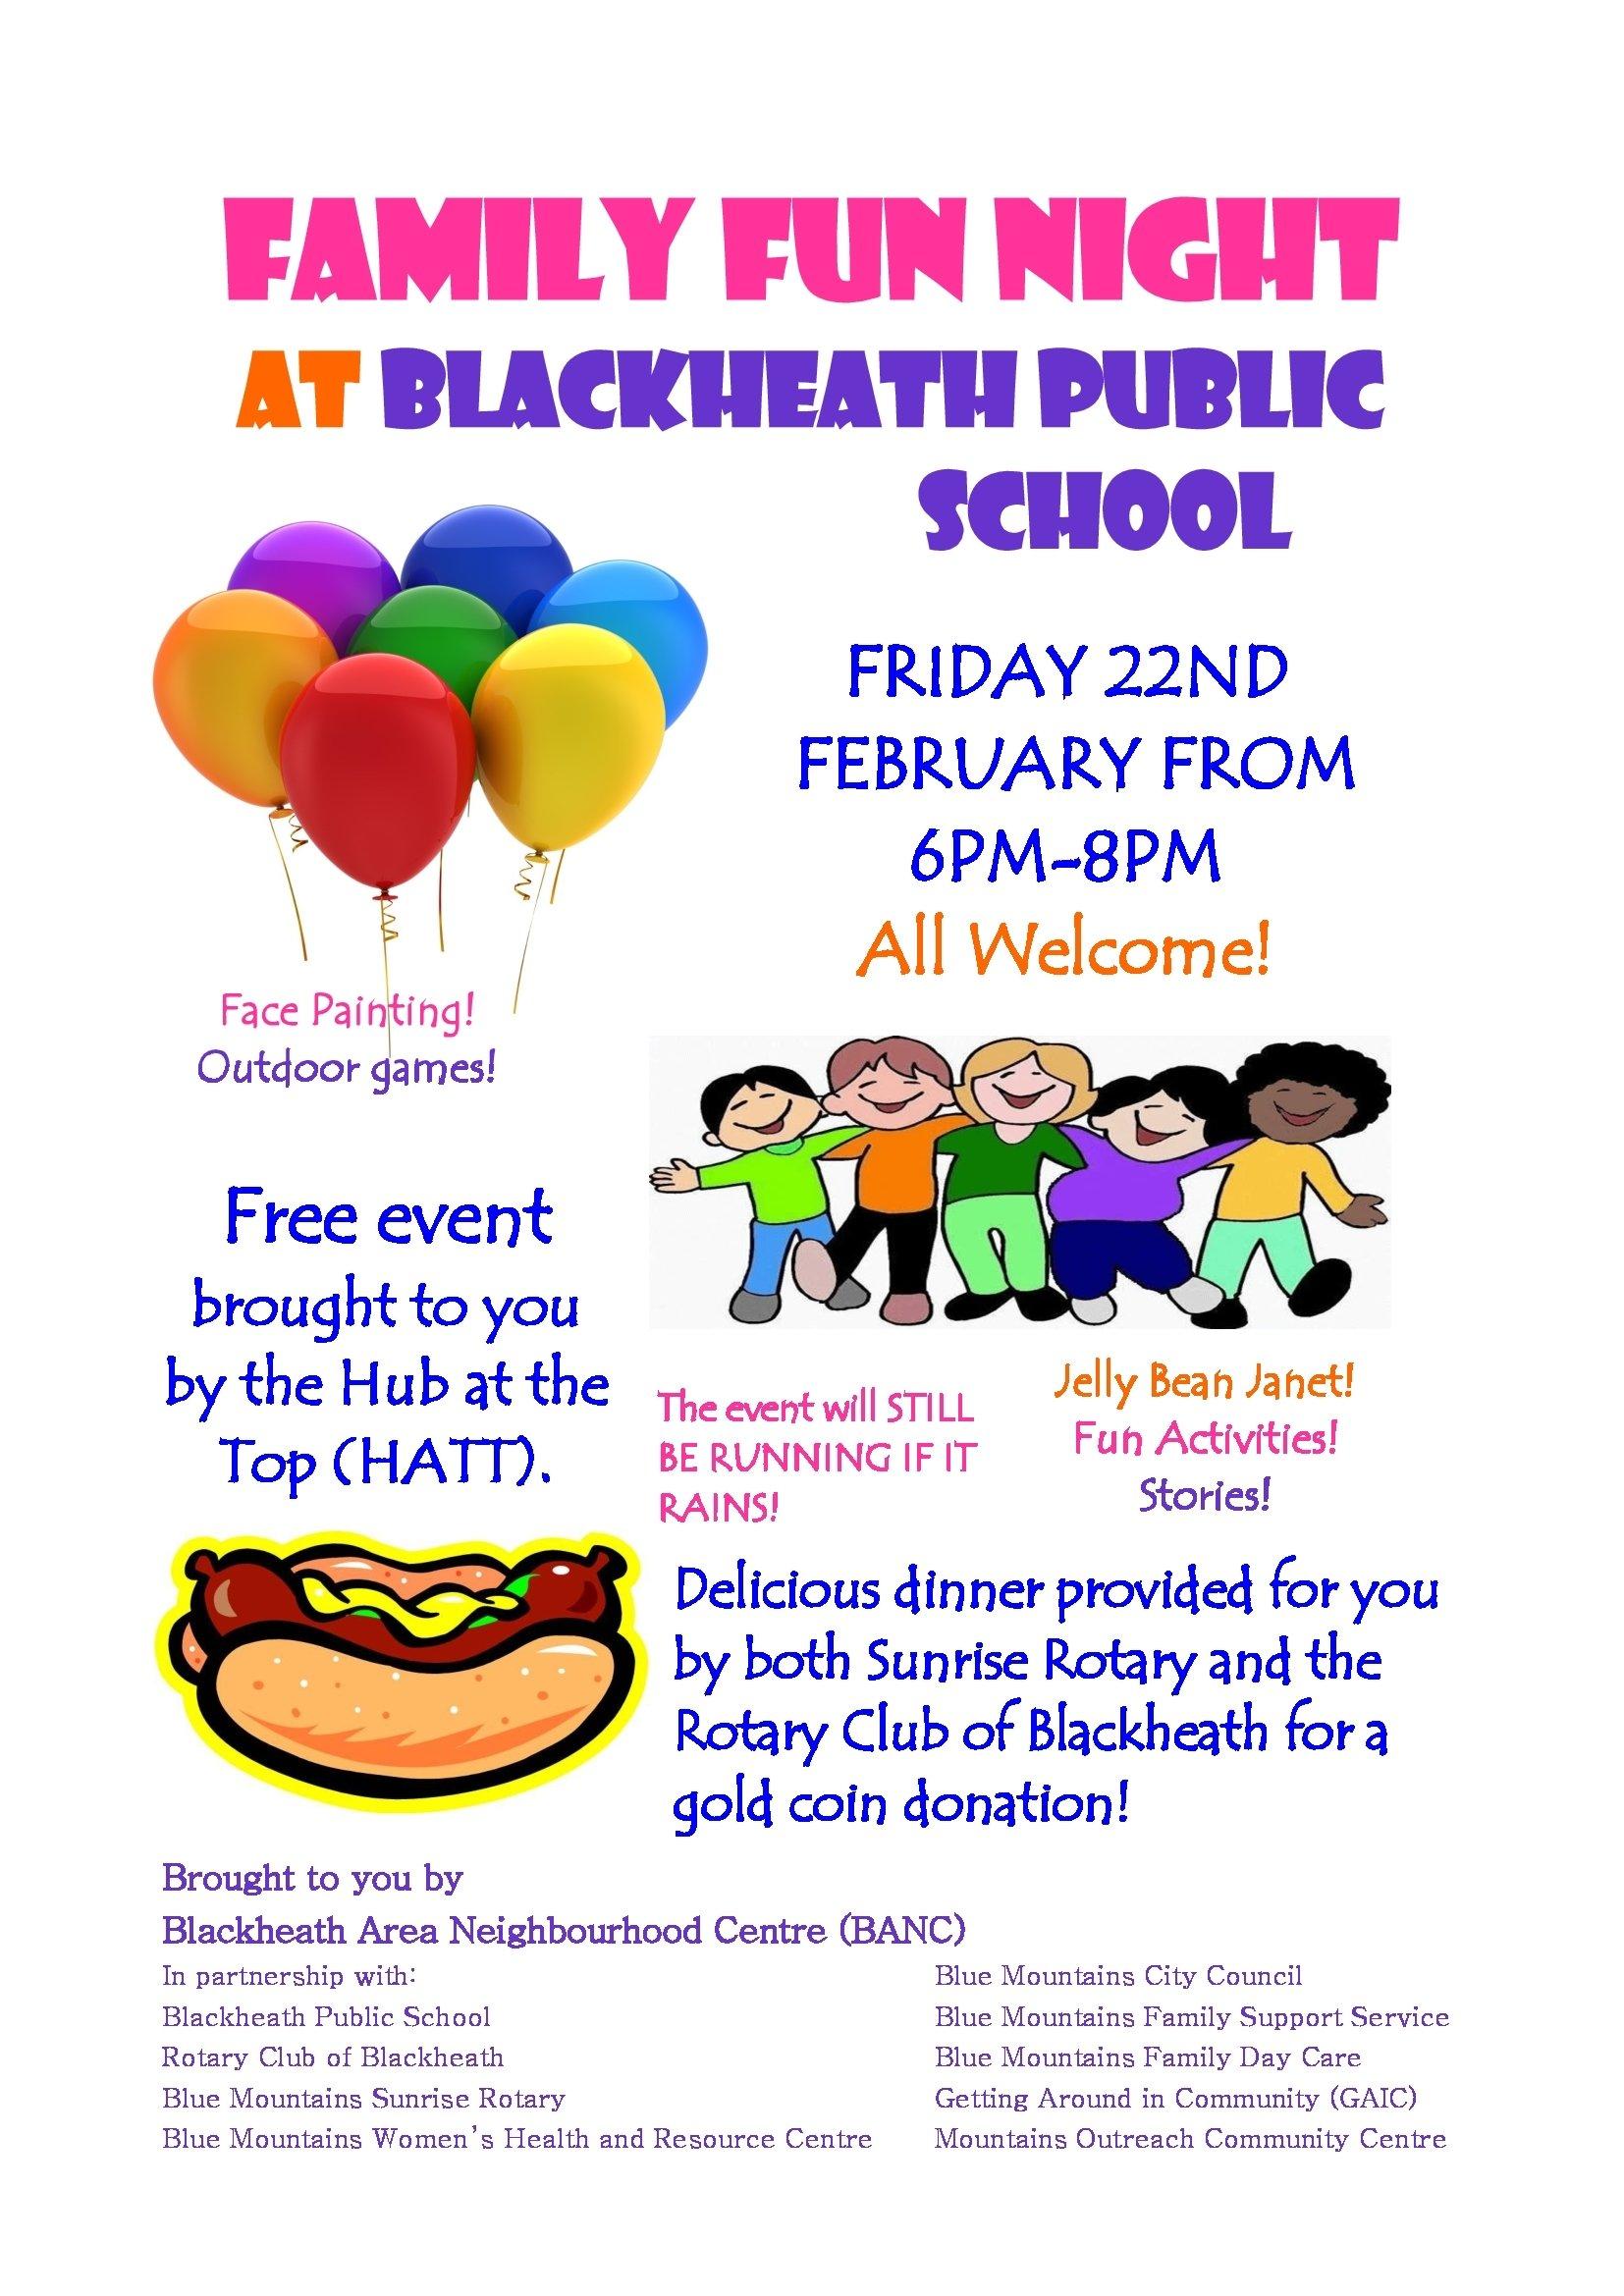 family fun night at blackheath public school | blackheath area